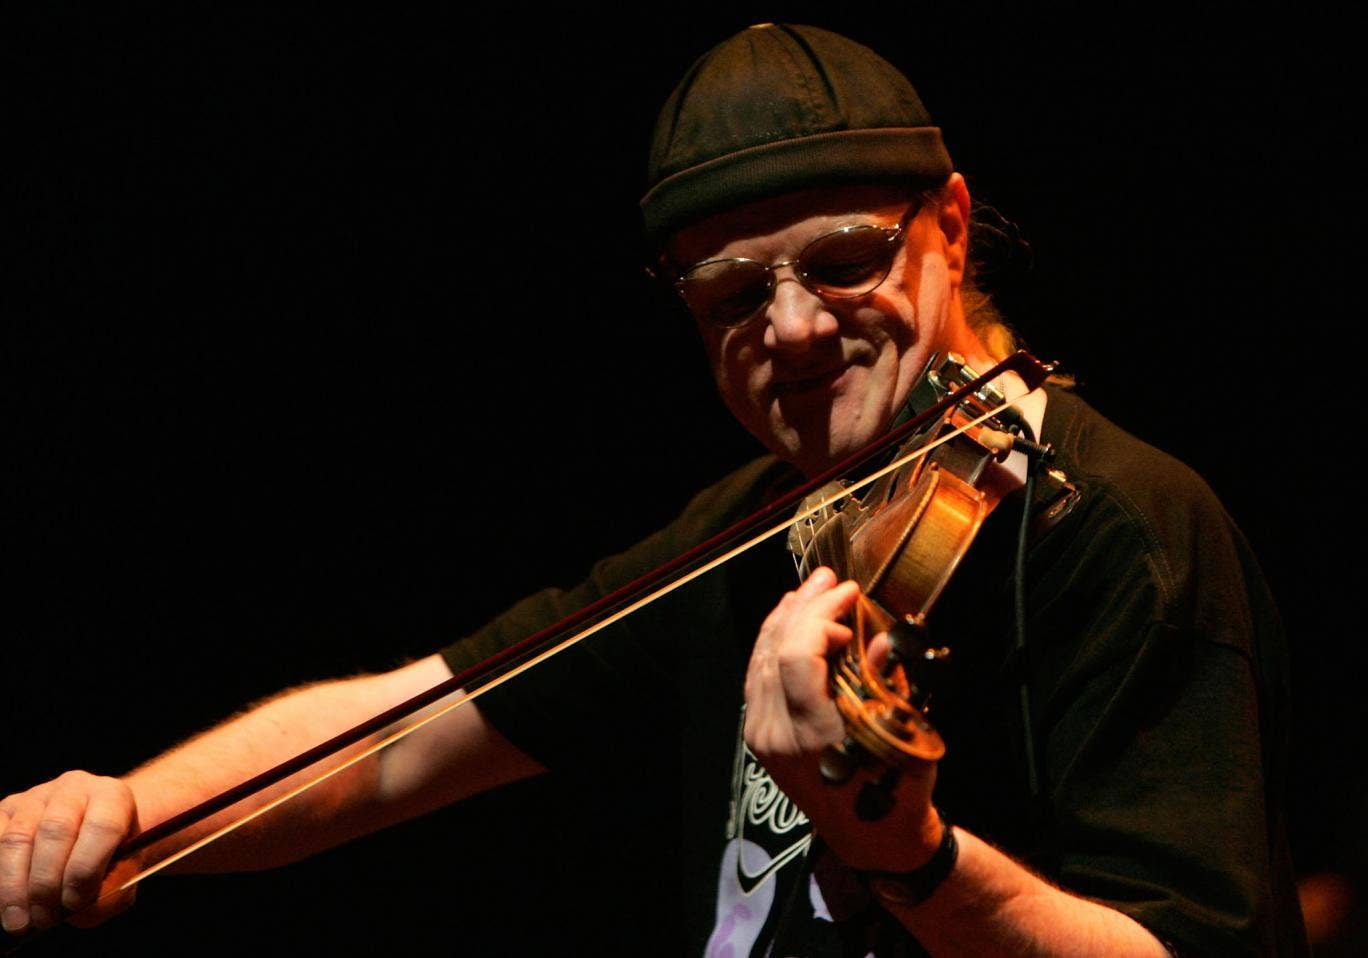 Violinist Richard 'Ric' Sandersof English folk band Fairport Convention perform live on stage